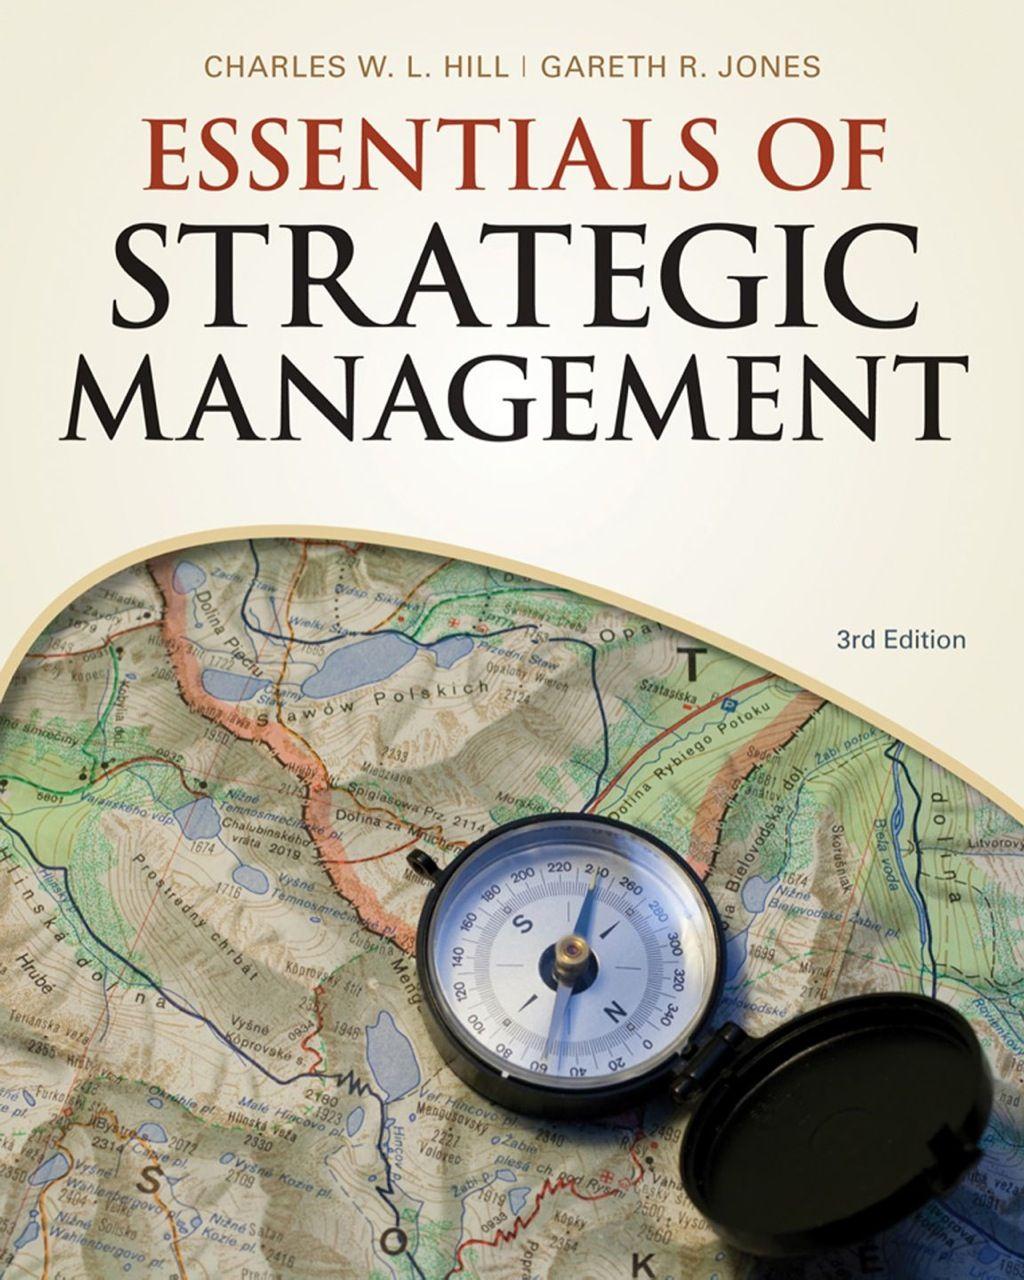 Essentials of Strategic Management (eBook Rental